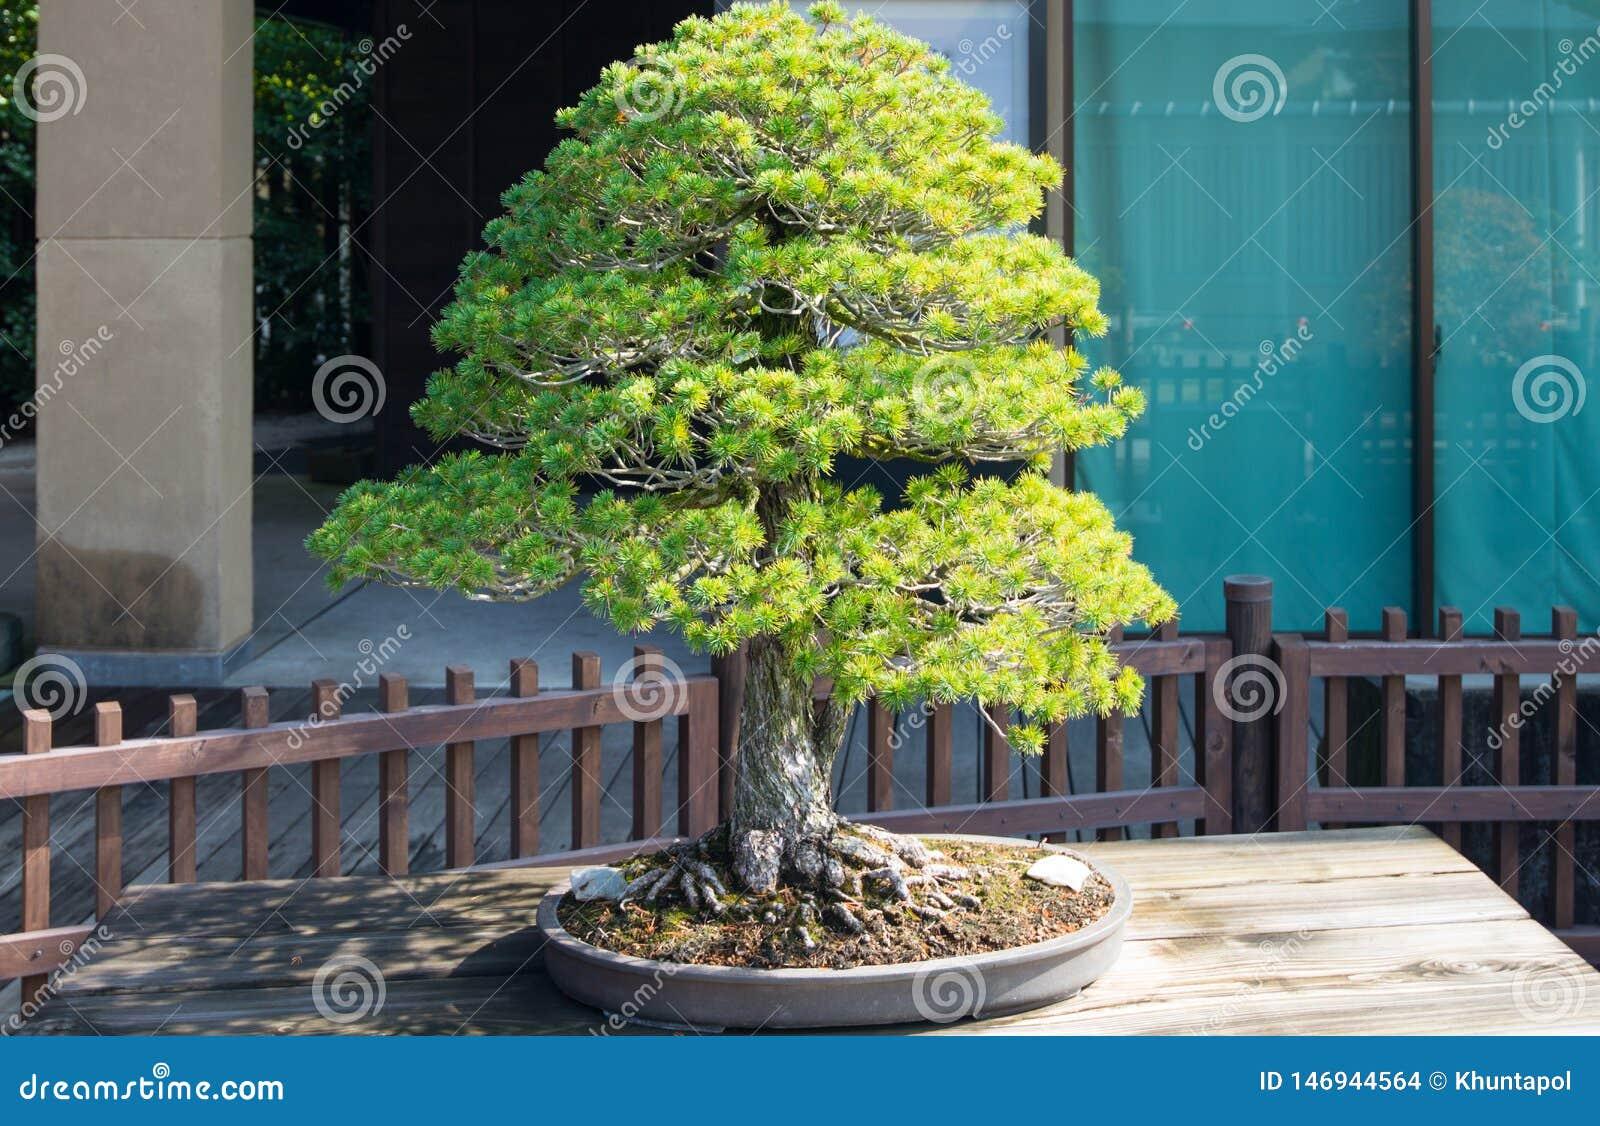 Japanese White Pine Bonsai Tree In Omiya Bonsai Village Stock Photo Image Of Juniper Hobby 146944564